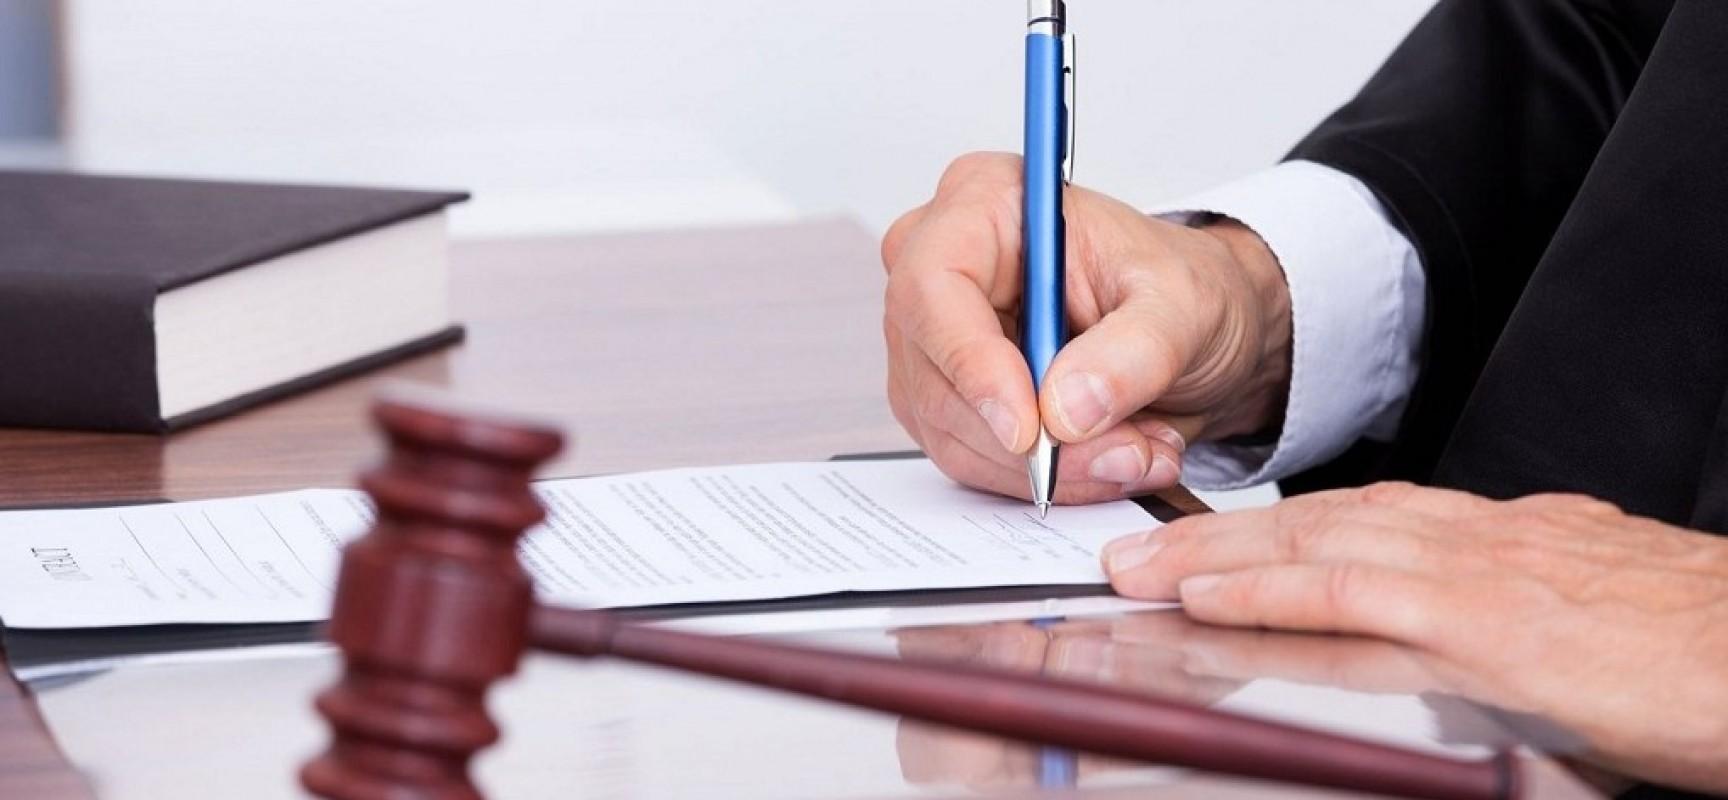 Custas Processuais Advogado Salvador Bahia